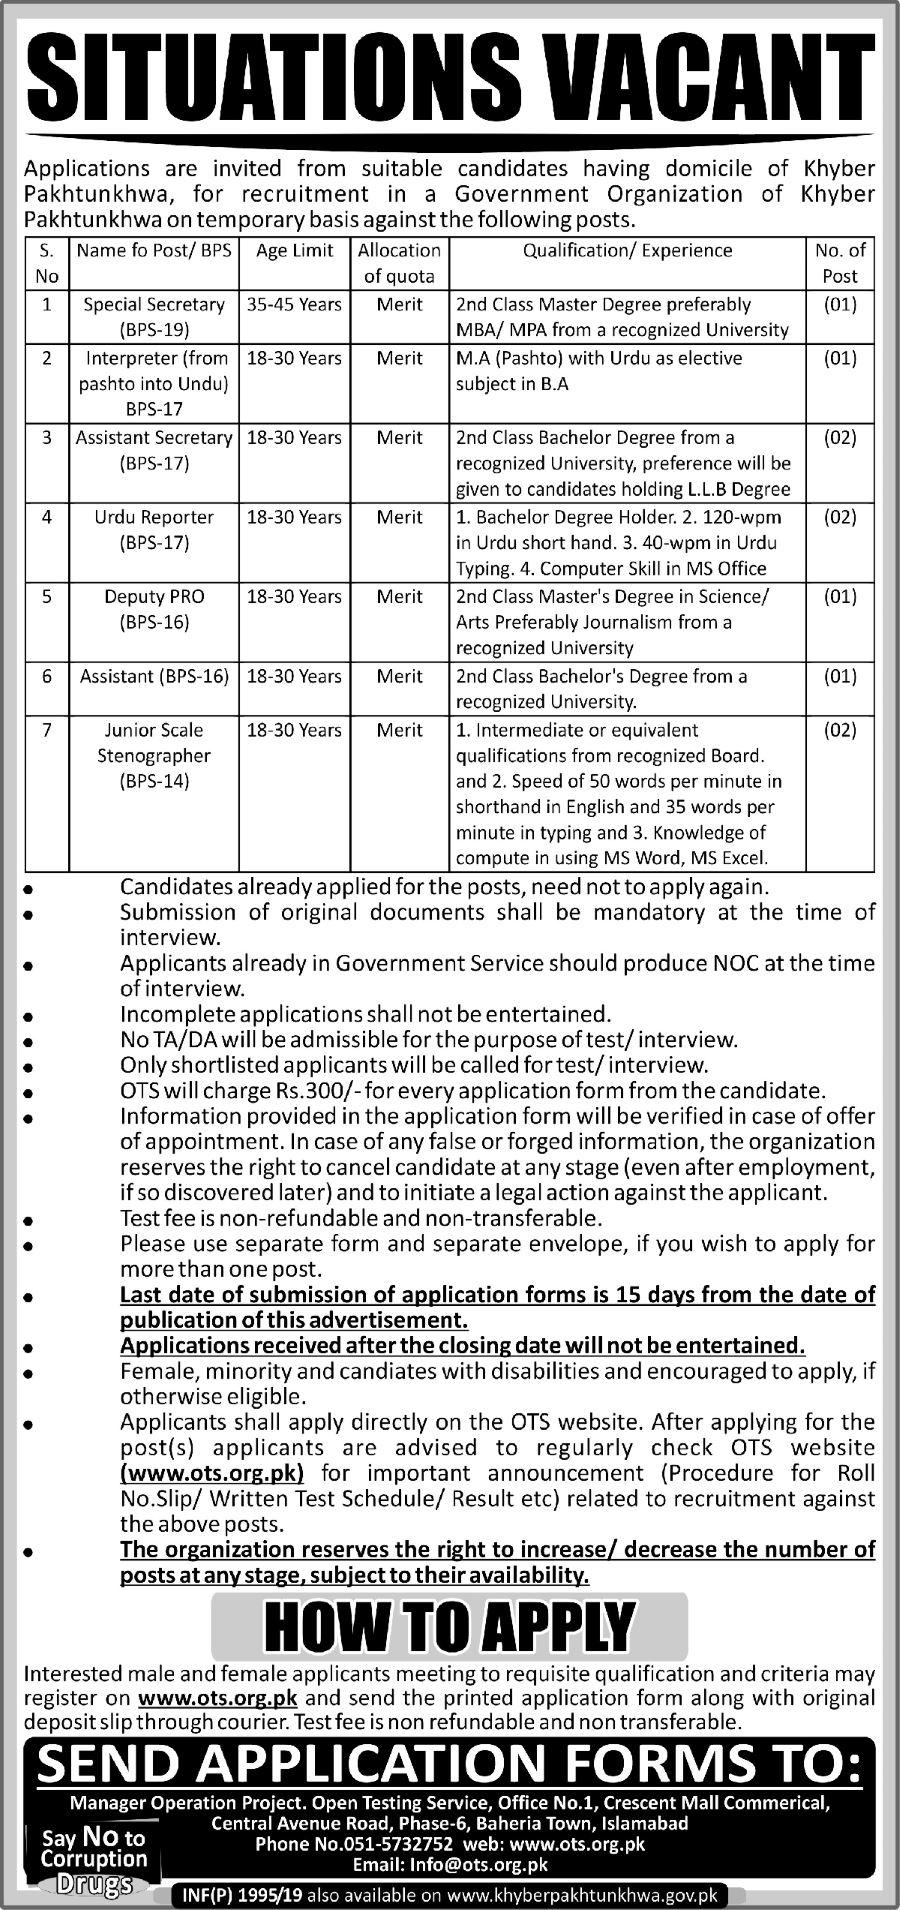 kp-ots-ajm Online Job Form Govt on